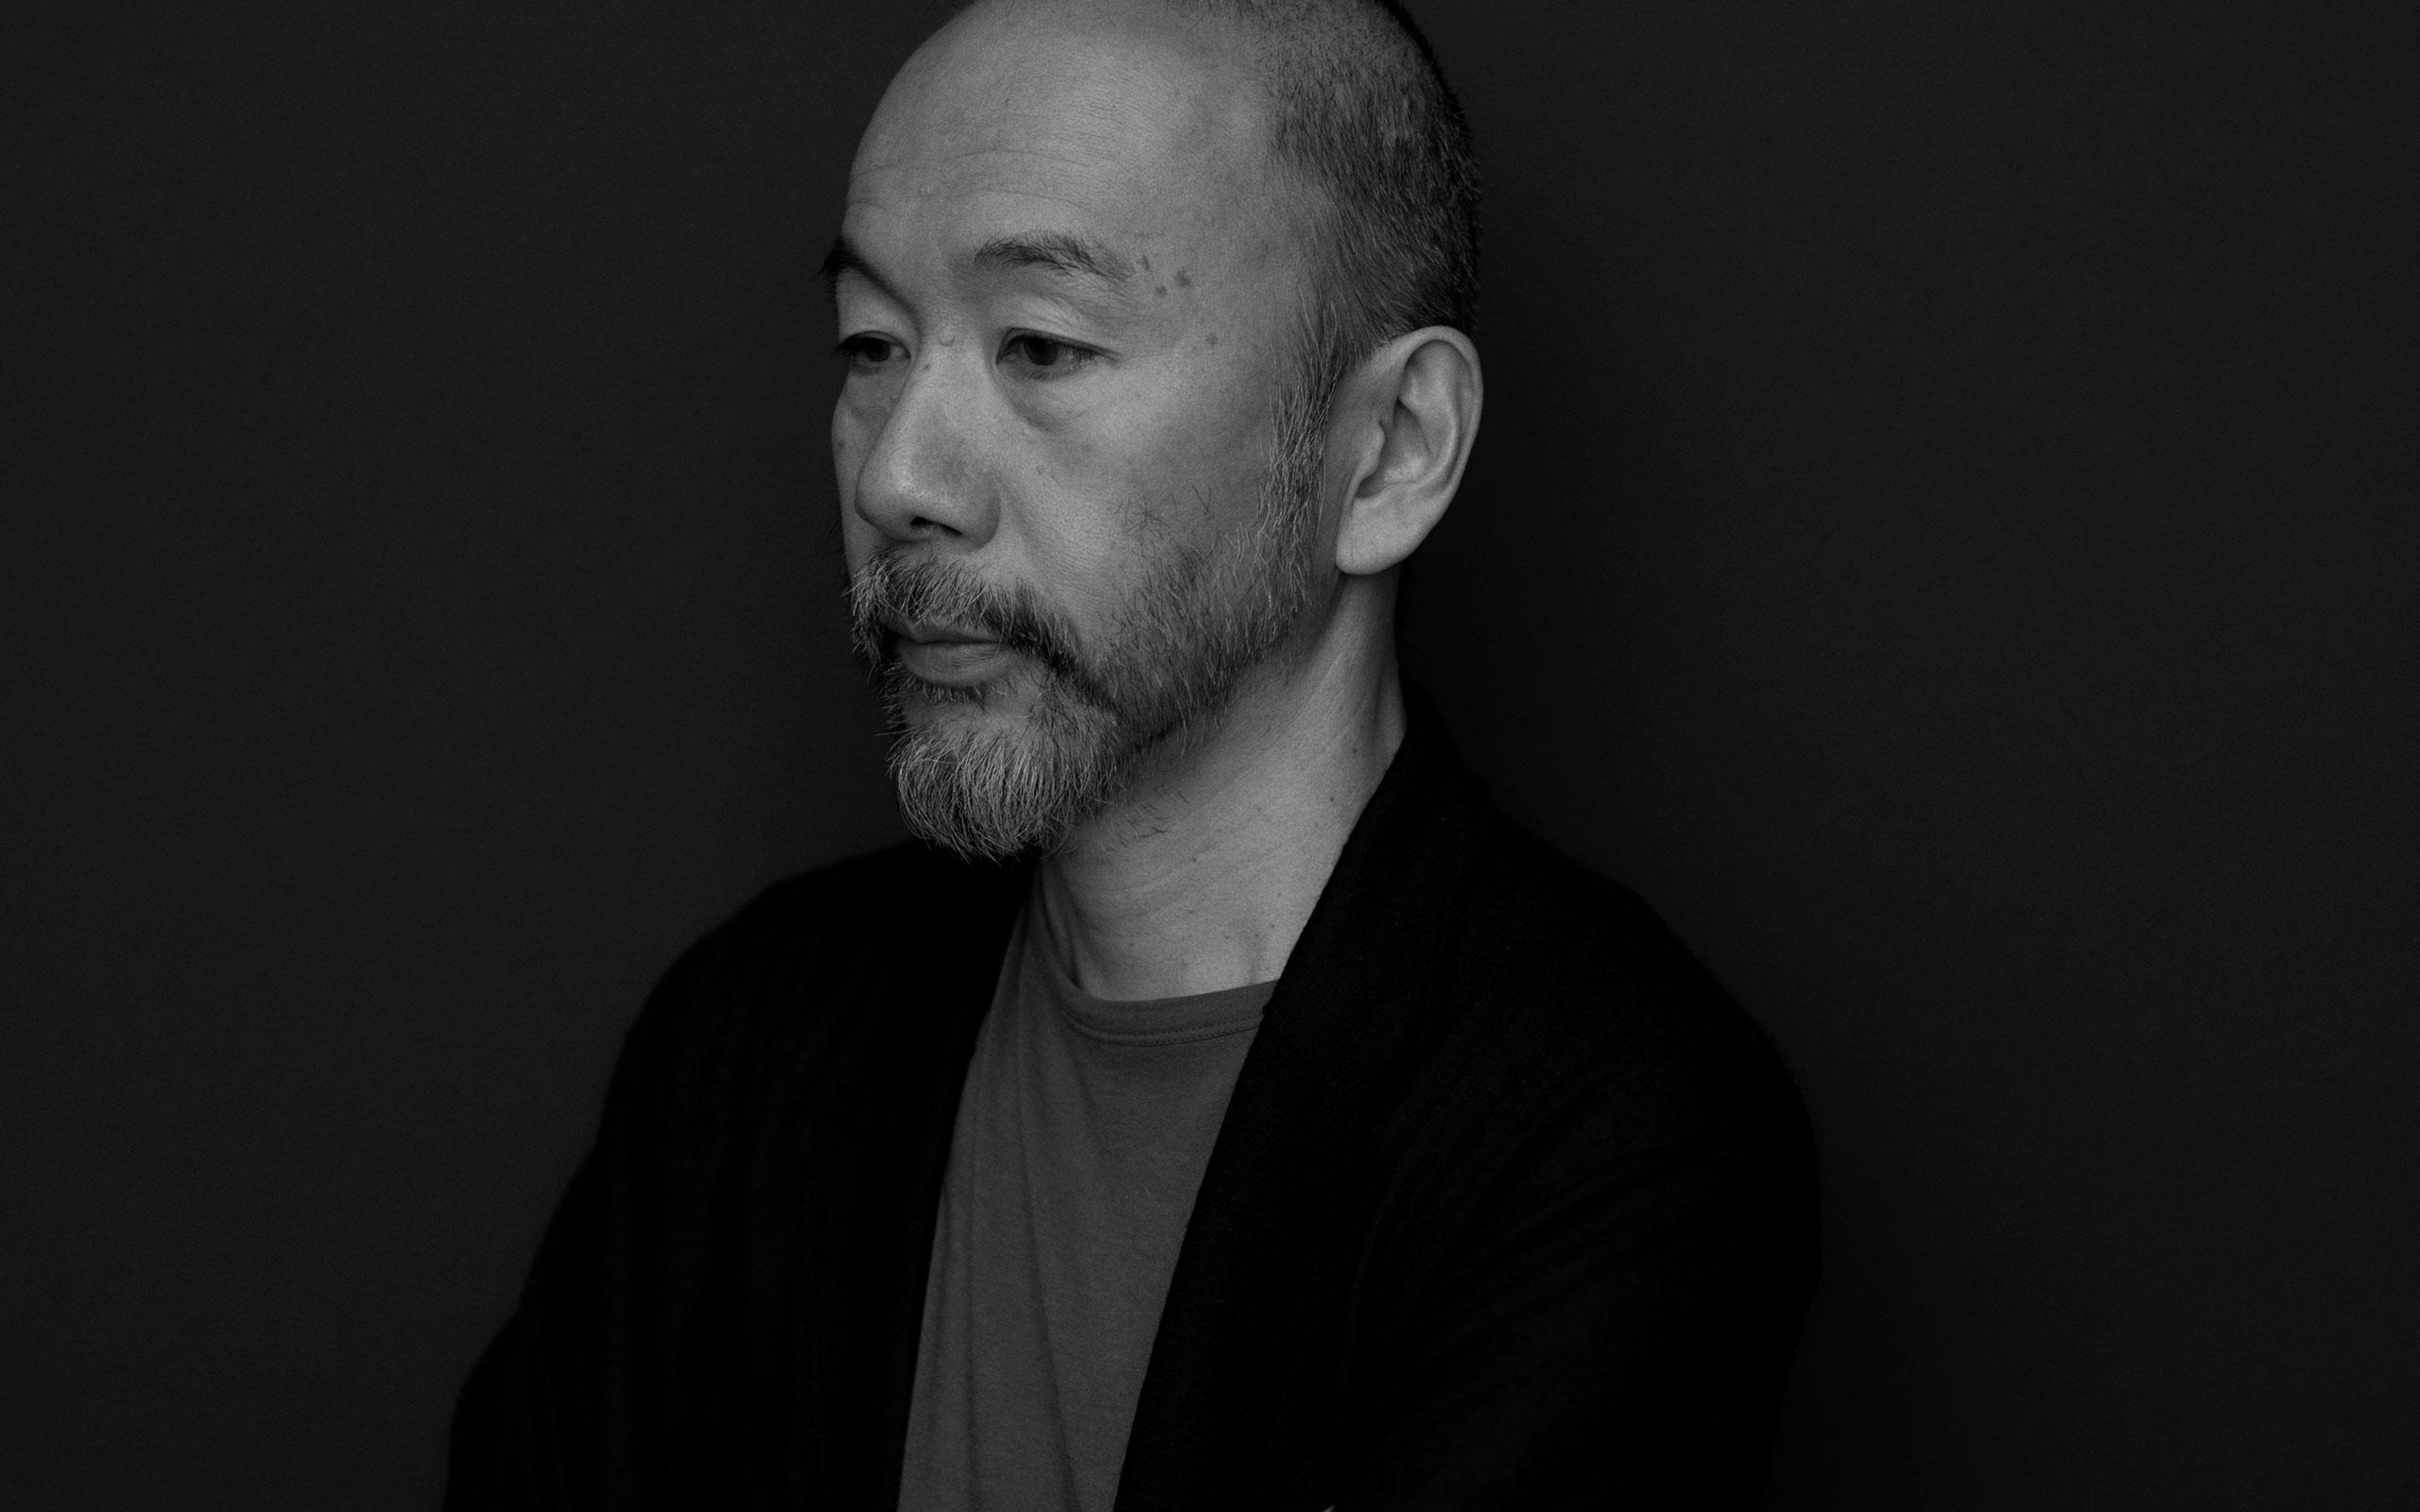 Interview With Shinya Tsukamoto